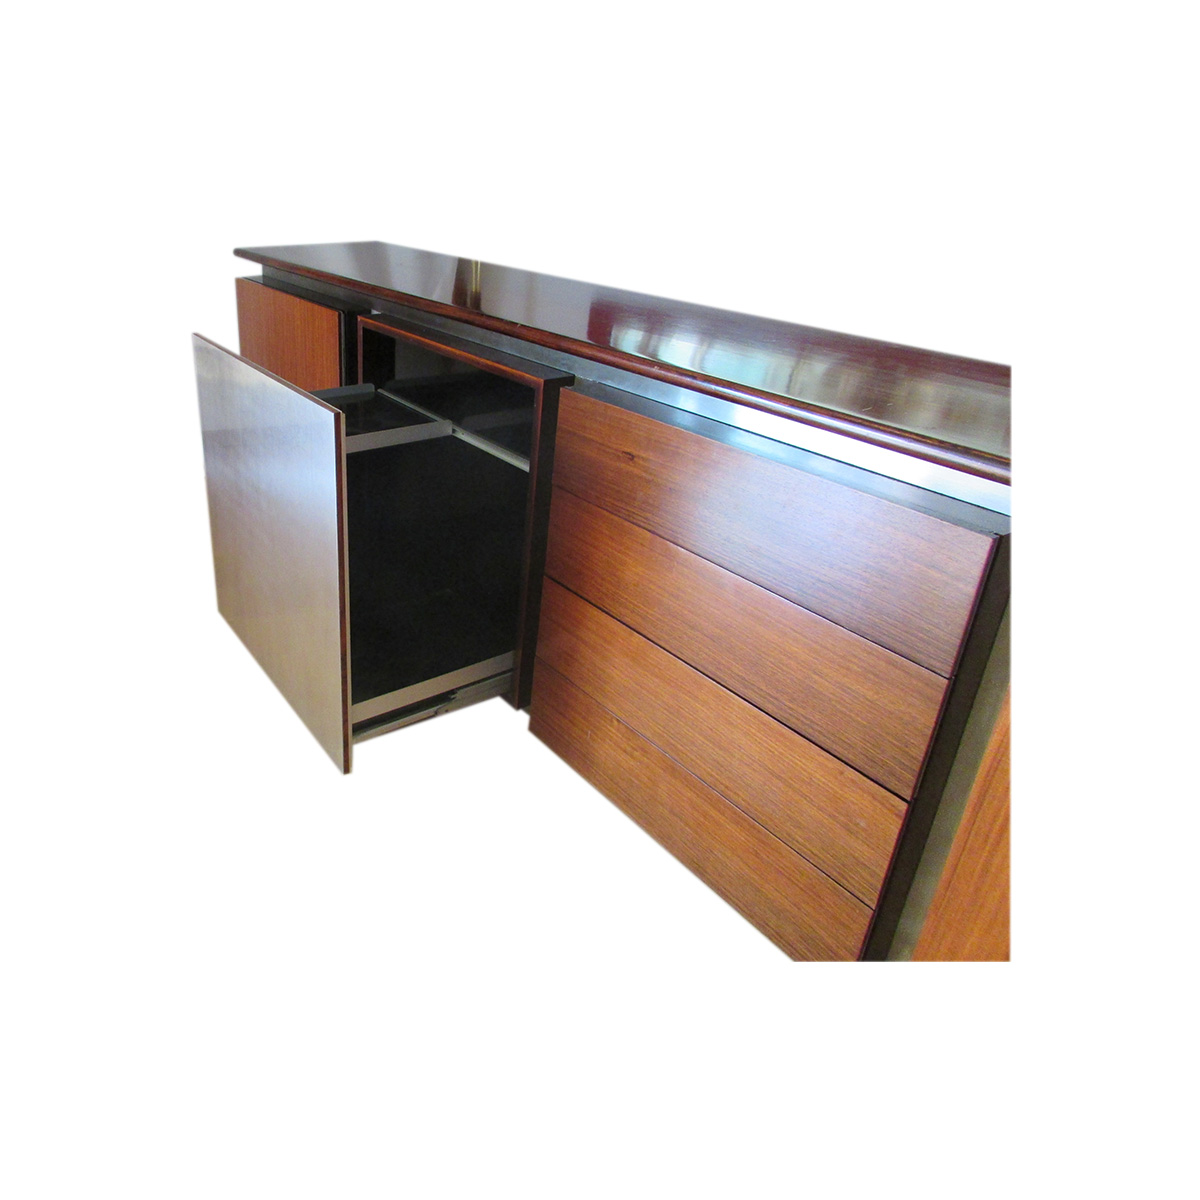 Stoppino gouju acerbis sideboard italy 1977 artichoke for Sideboard 70 cm